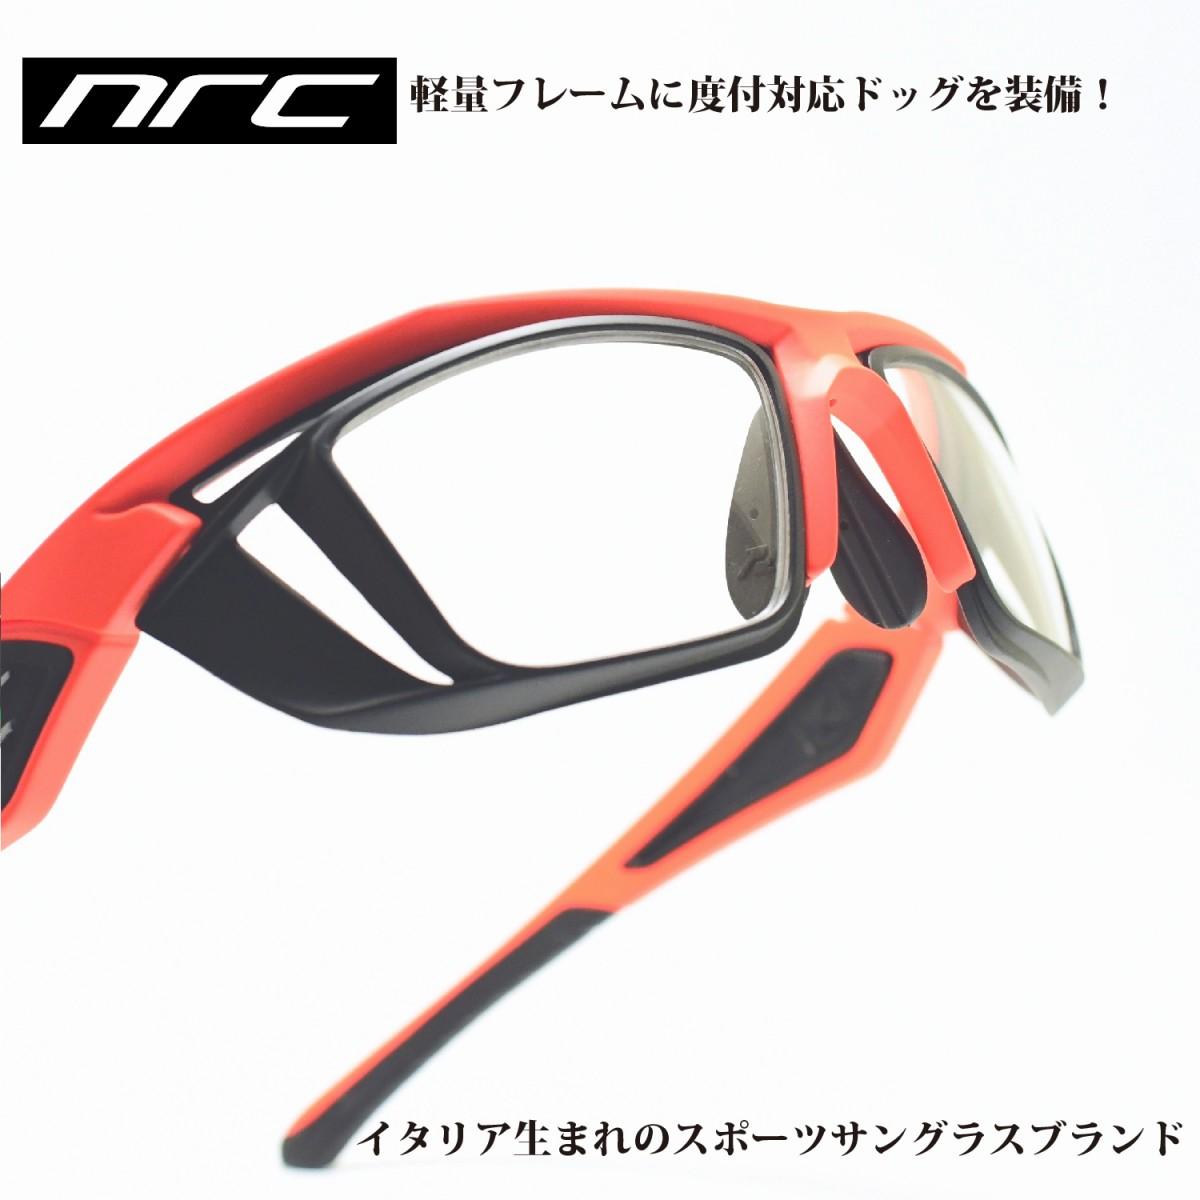 nrc エヌアールシー X5 DOCBLACKSHADOW/OPTICAL DOCメガネ 眼鏡 めがね メンズ レディース おしゃれ ブランド人気 おすすめ フレーム 流行り 度付き レンズ サングラス